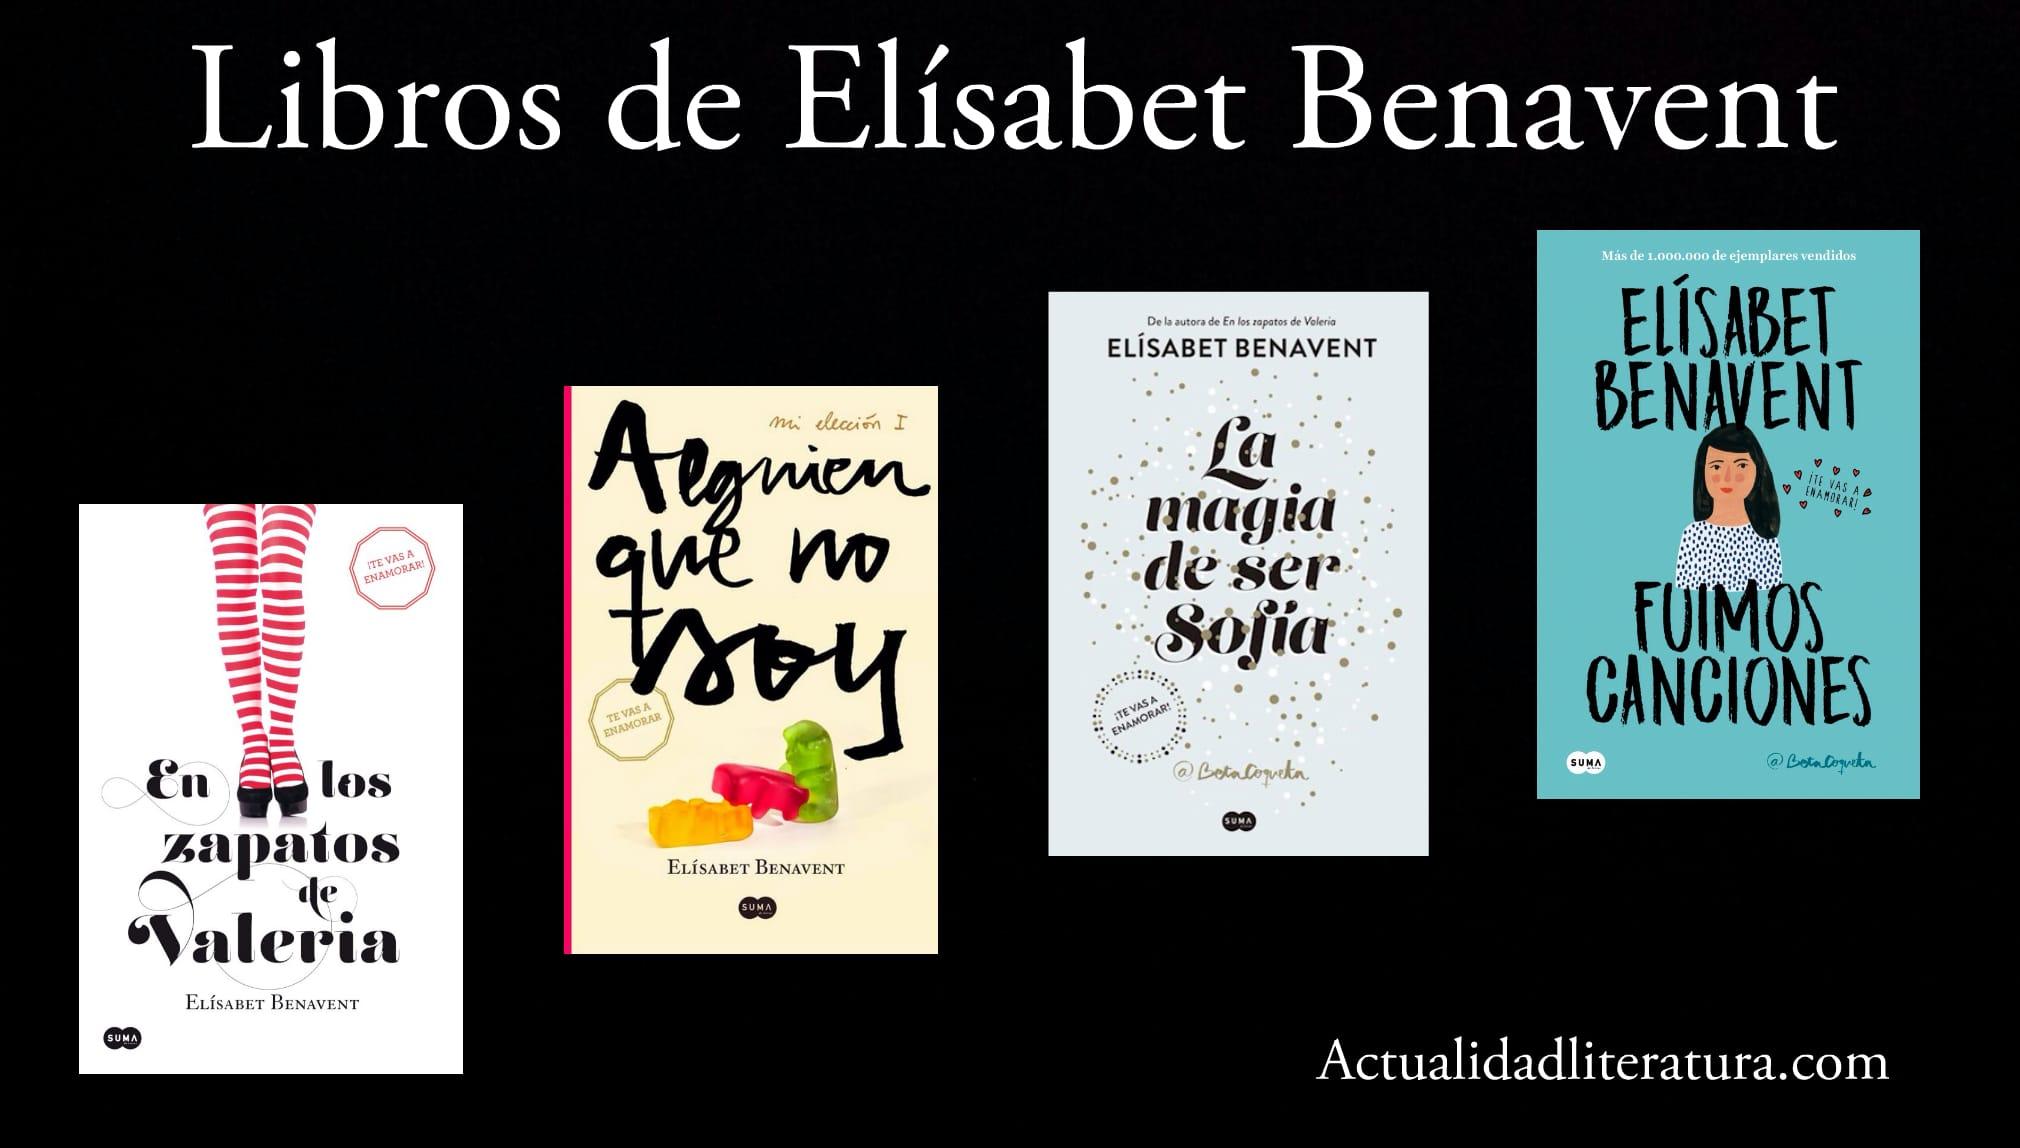 Libros de Elísabet Benavent